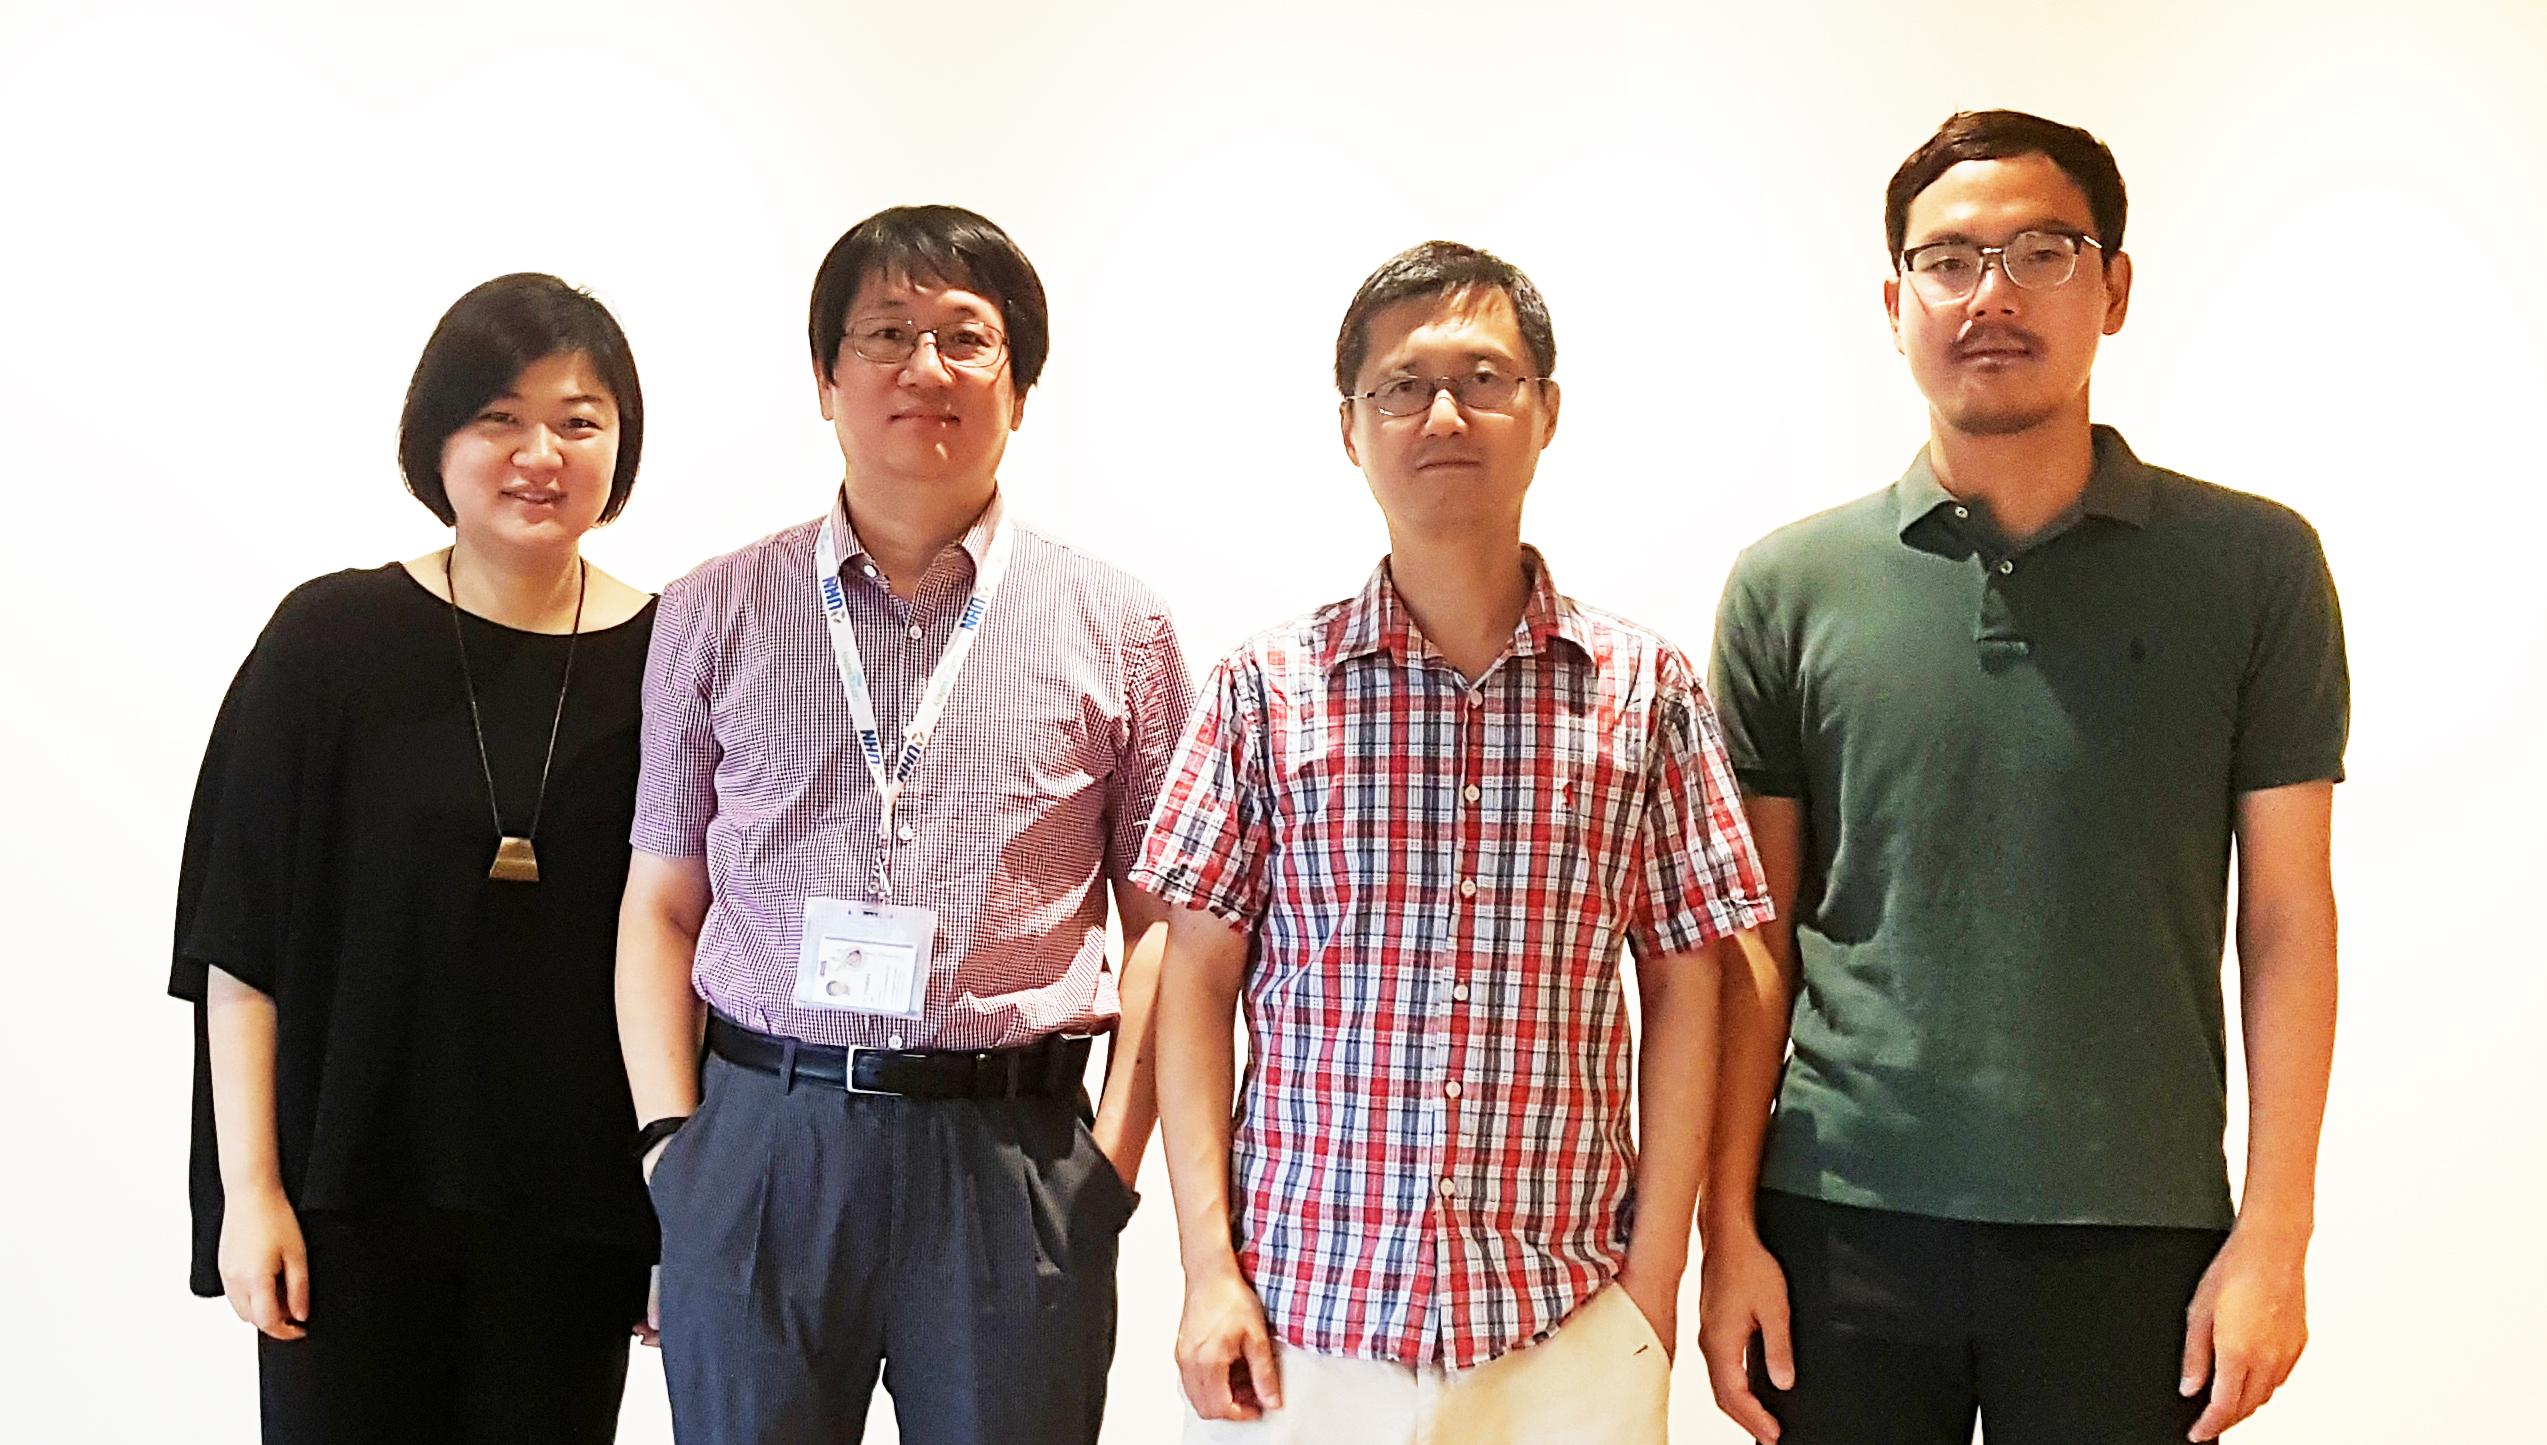 Korean & Canadian scientists